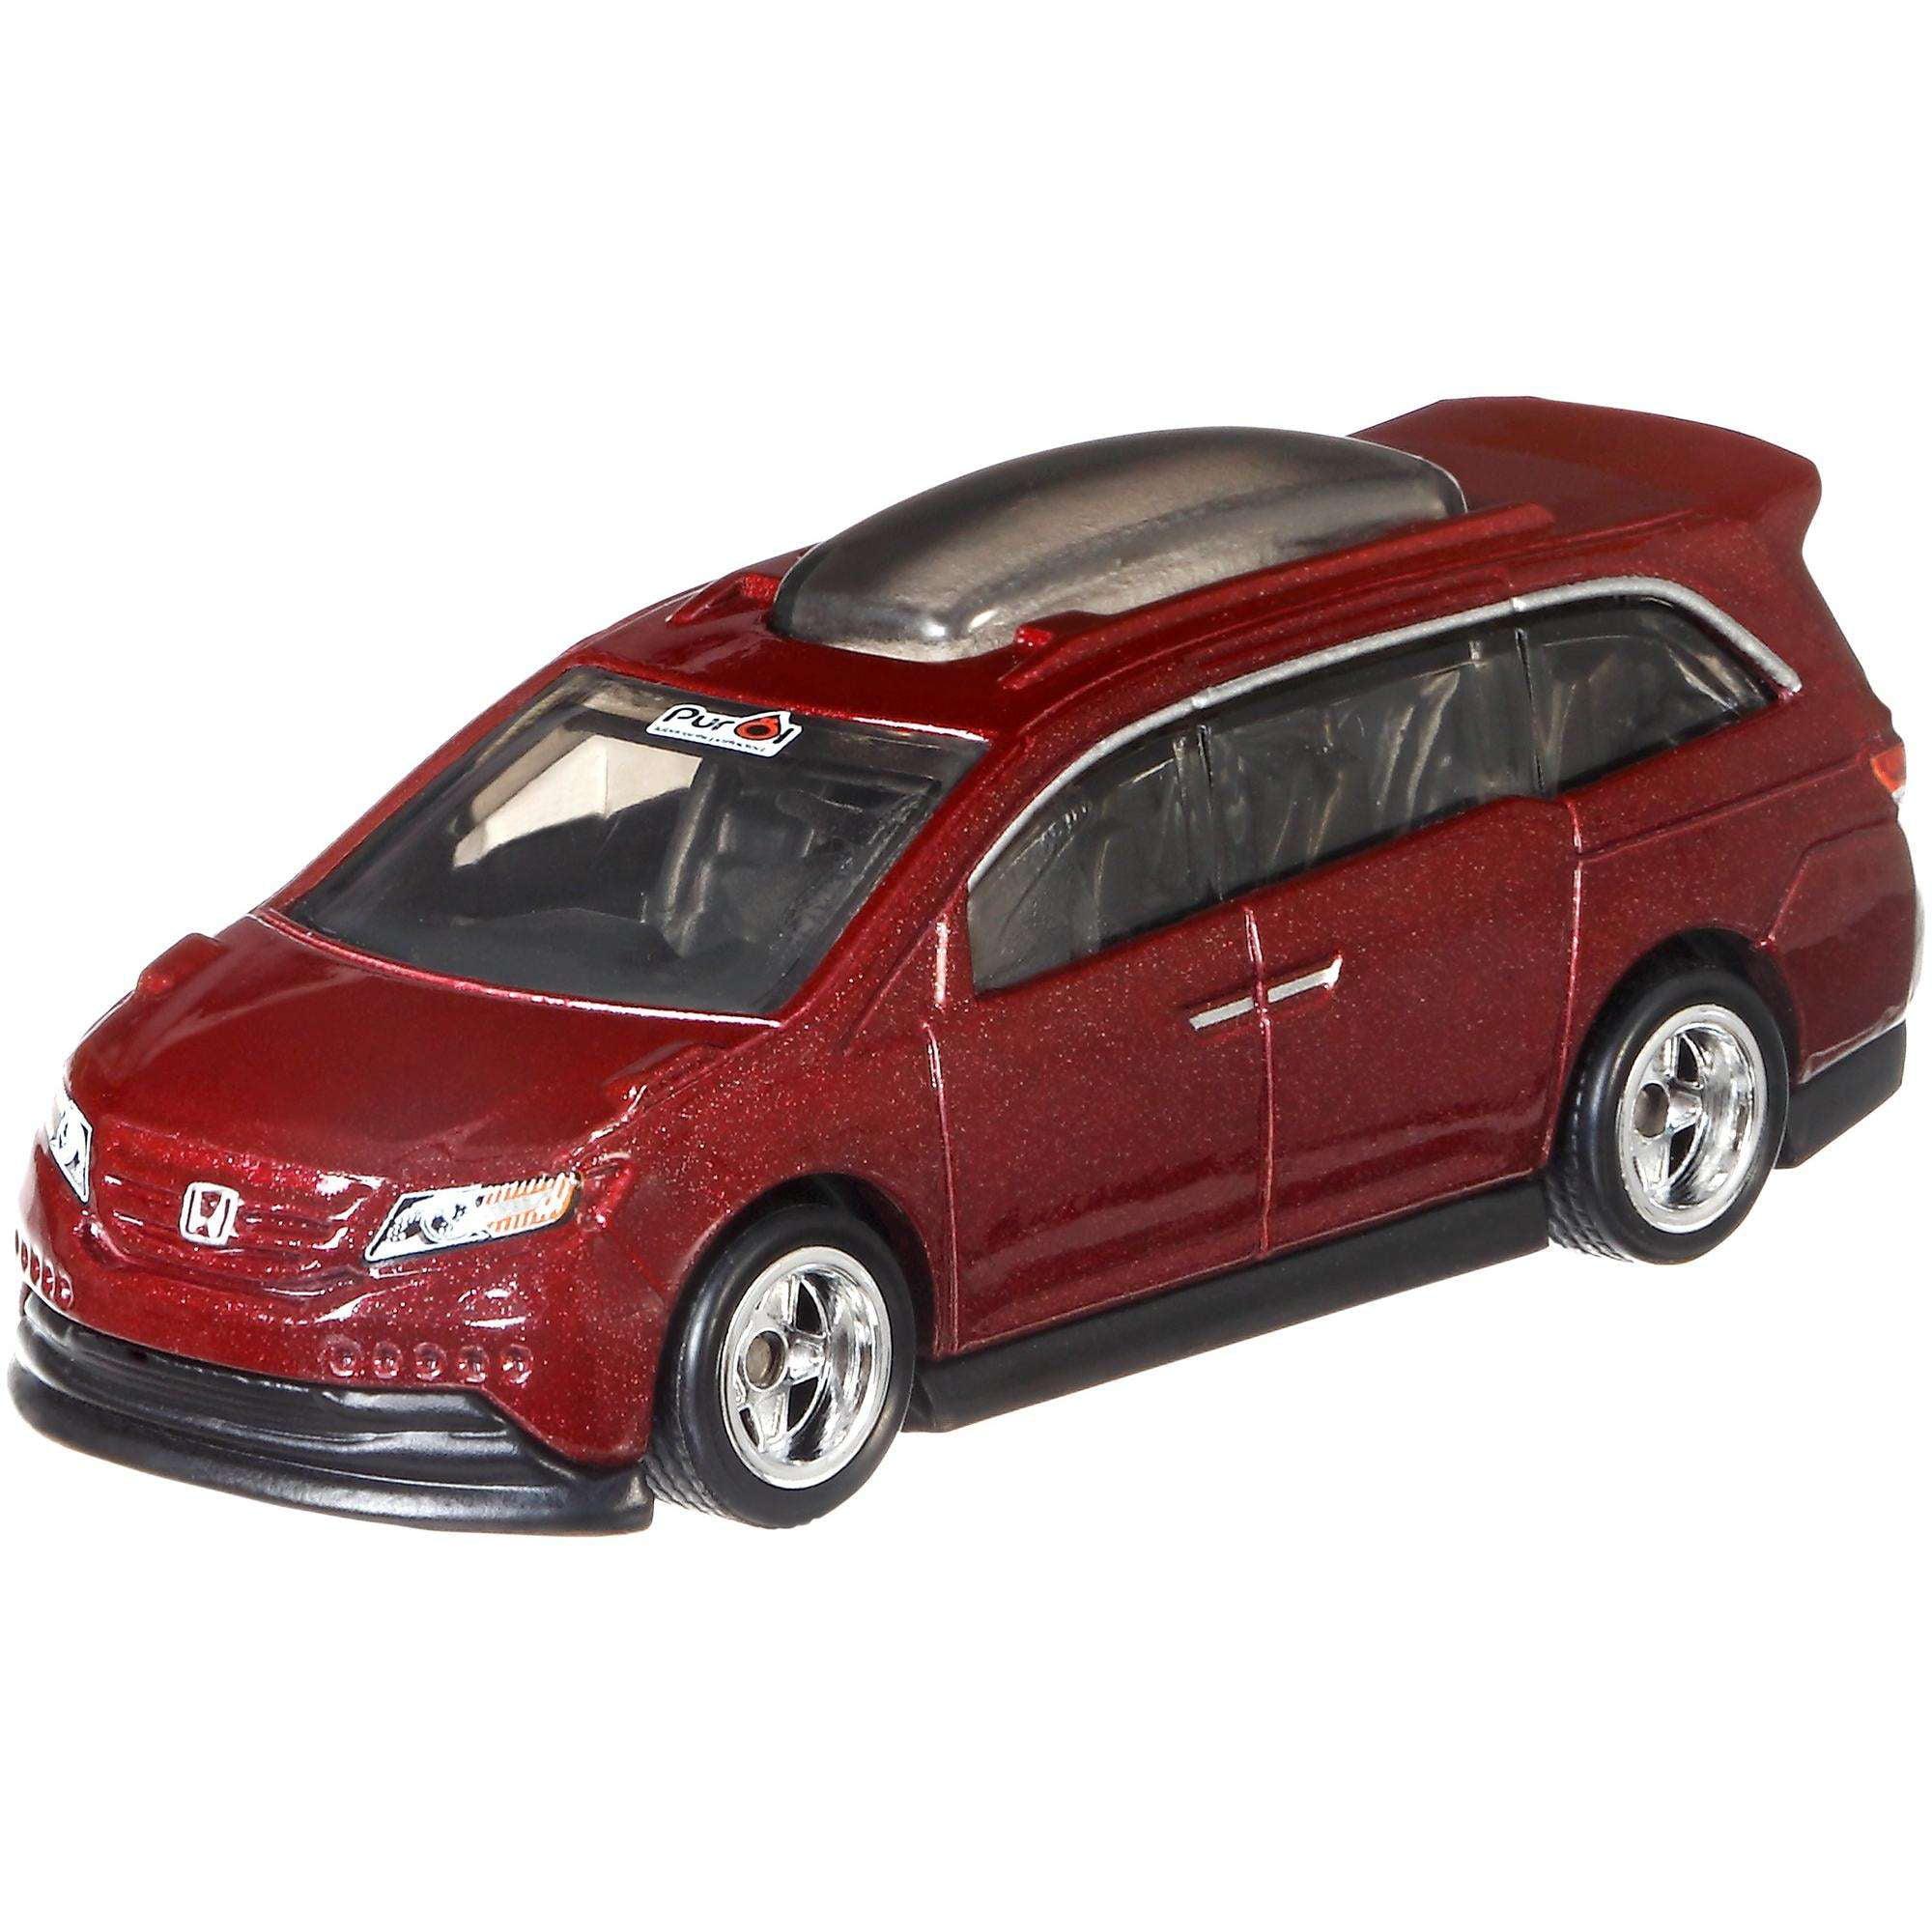 Hot Wheels Car Culture Honda Odyssey Vehicle by Mattel